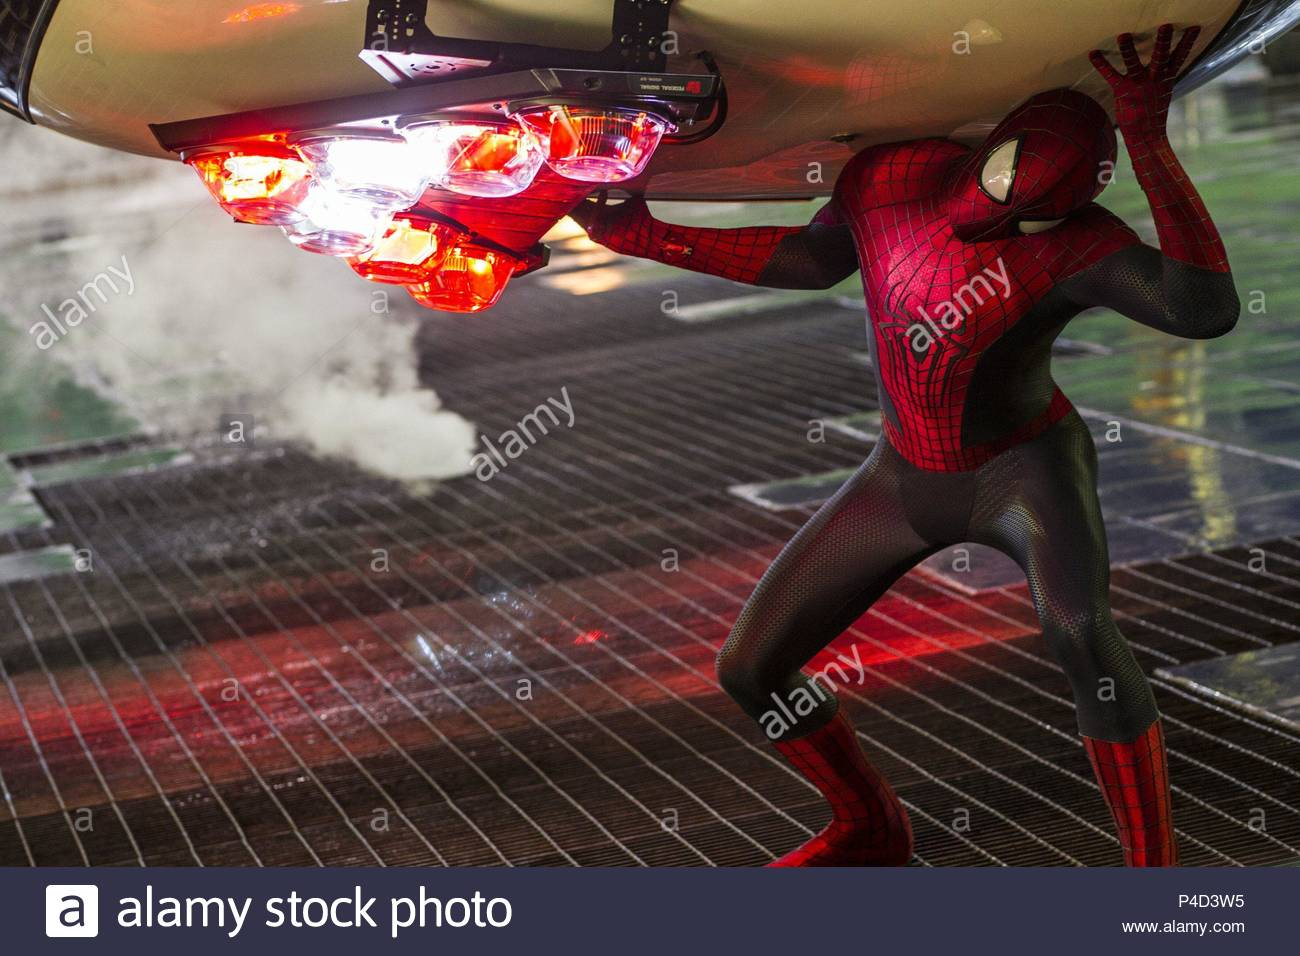 spider man 2 stock photos amp spider man 2 stock images alamy